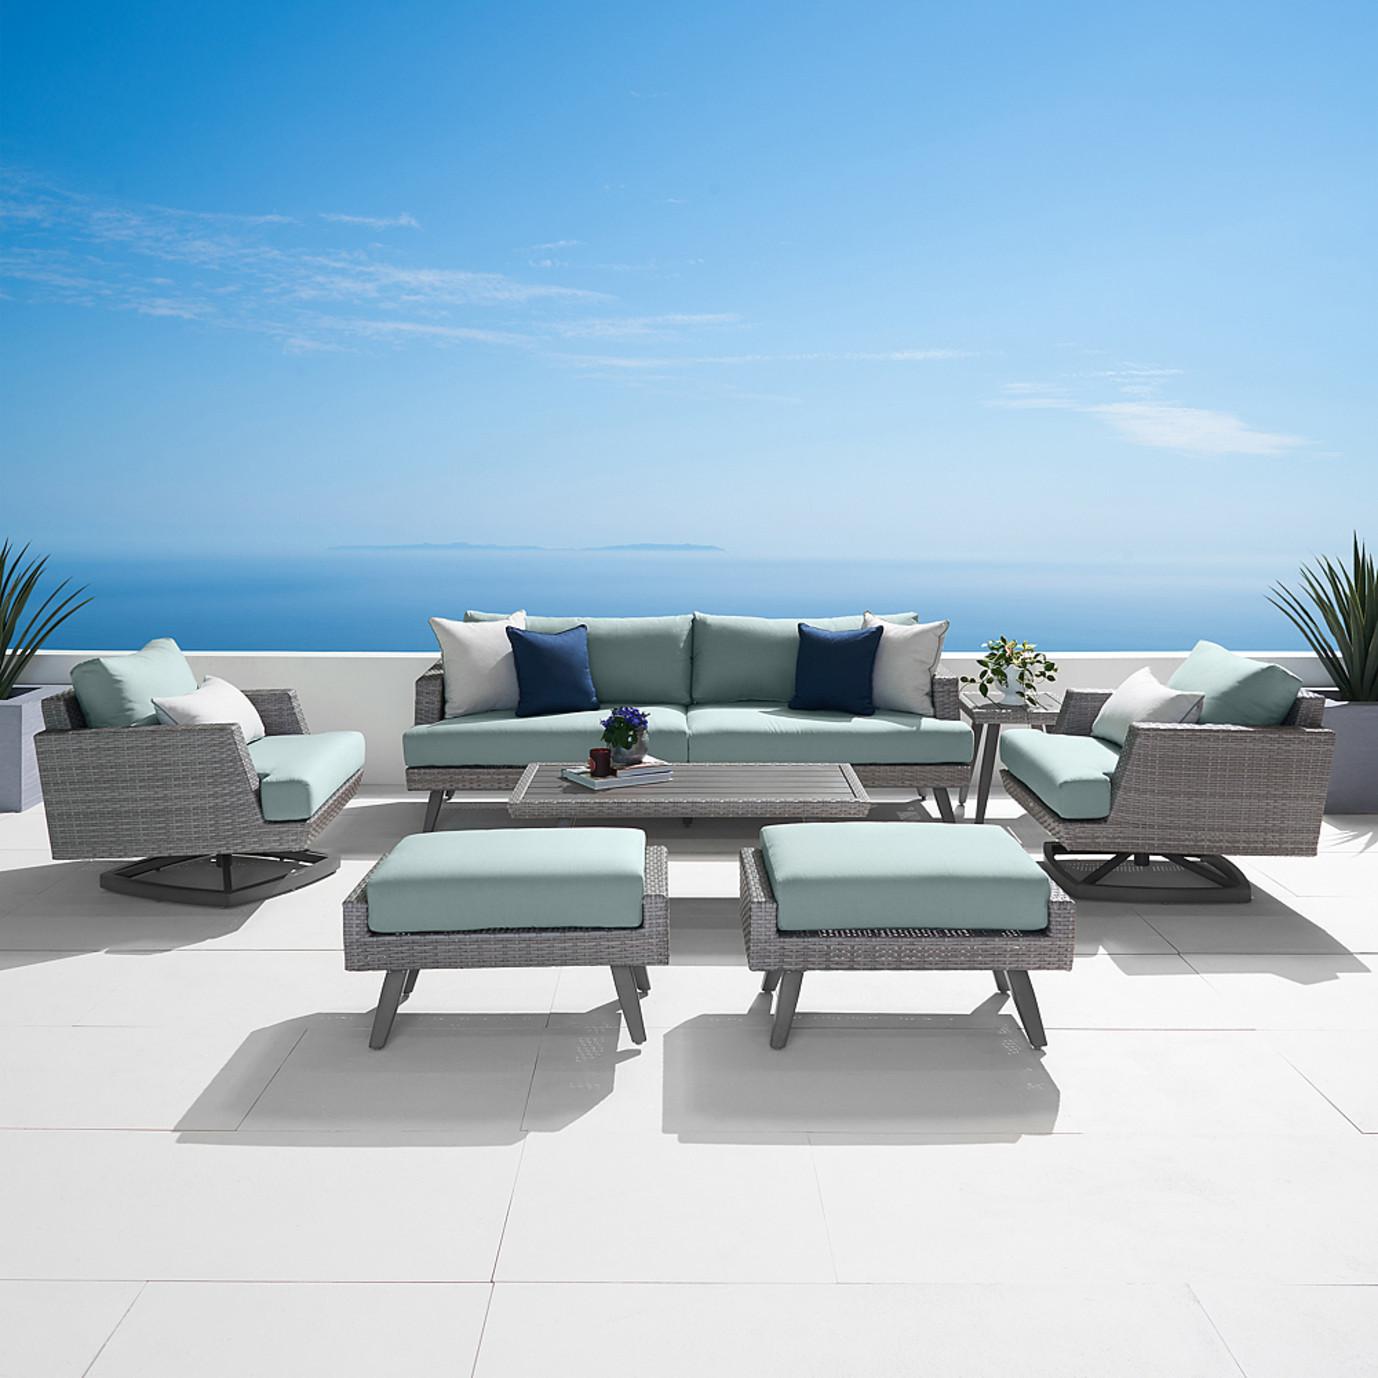 Portofino® Casual 7pc Motion Seating Set - Spa Blue